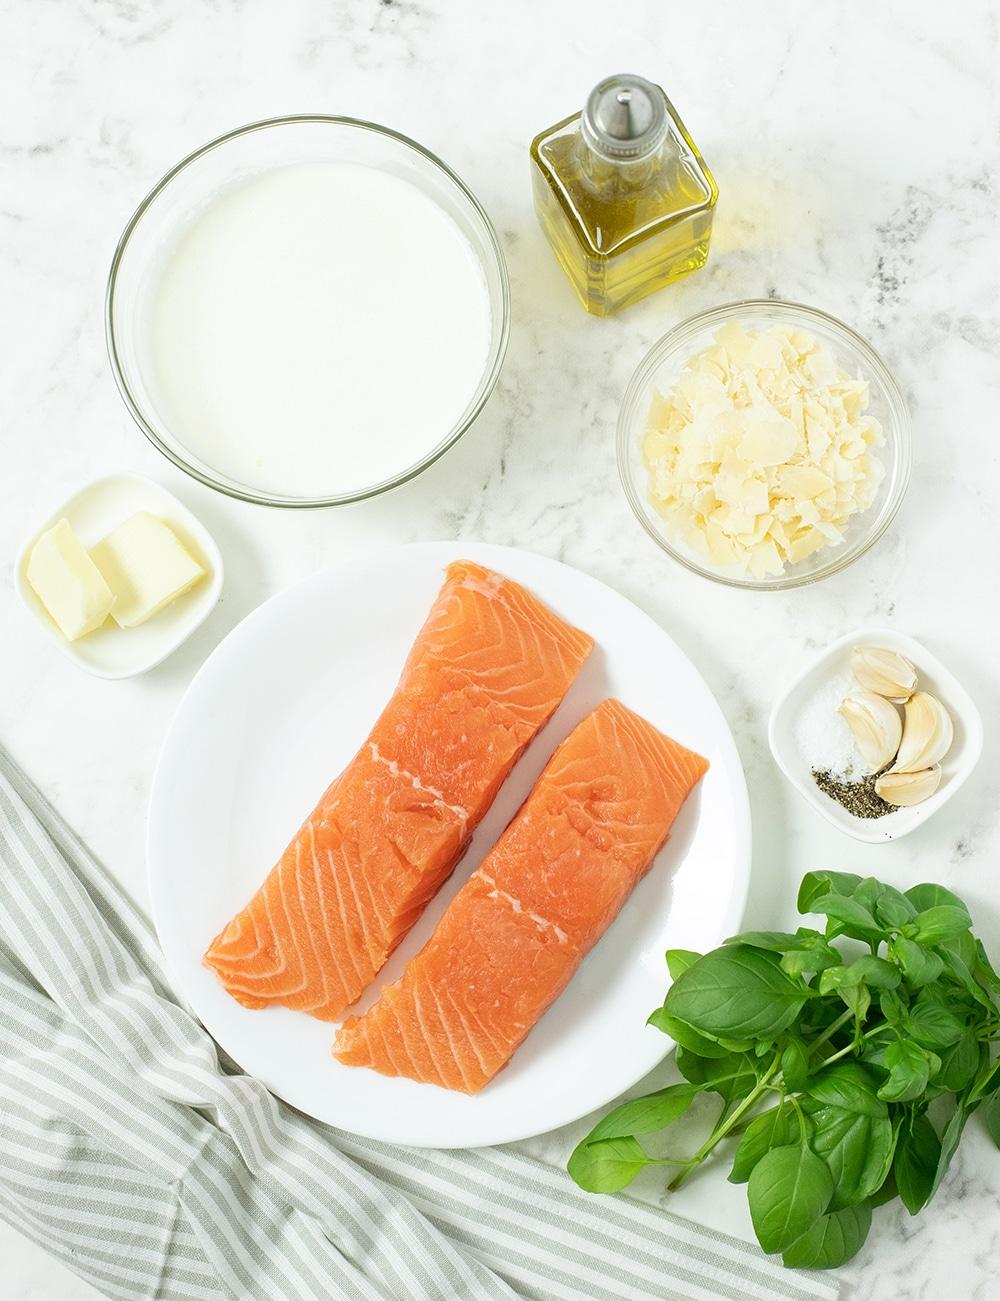 Ingredients for pan roasted salmon